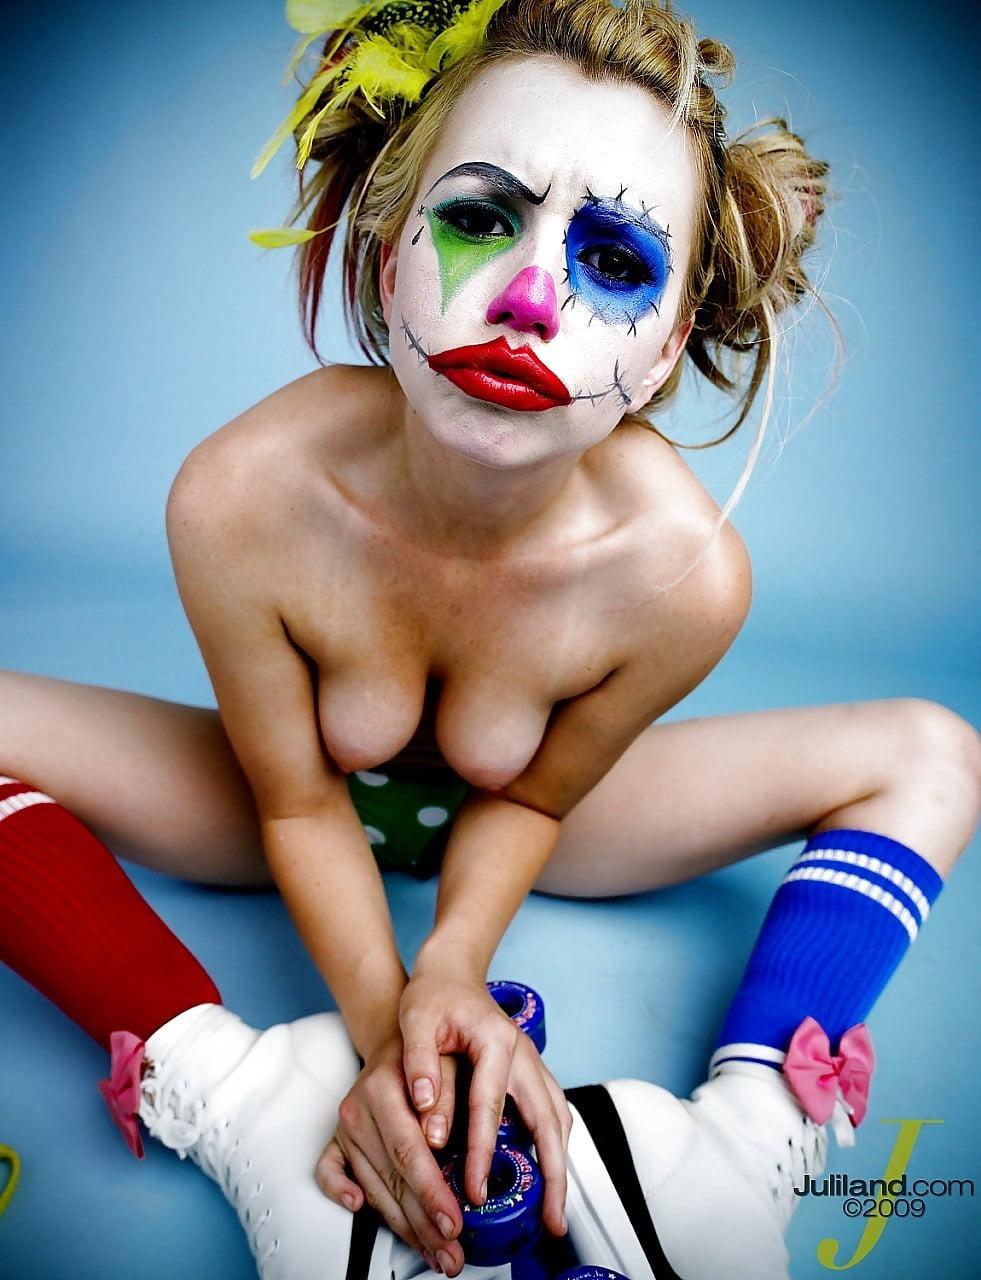 Clown girl nude pics — pic 13